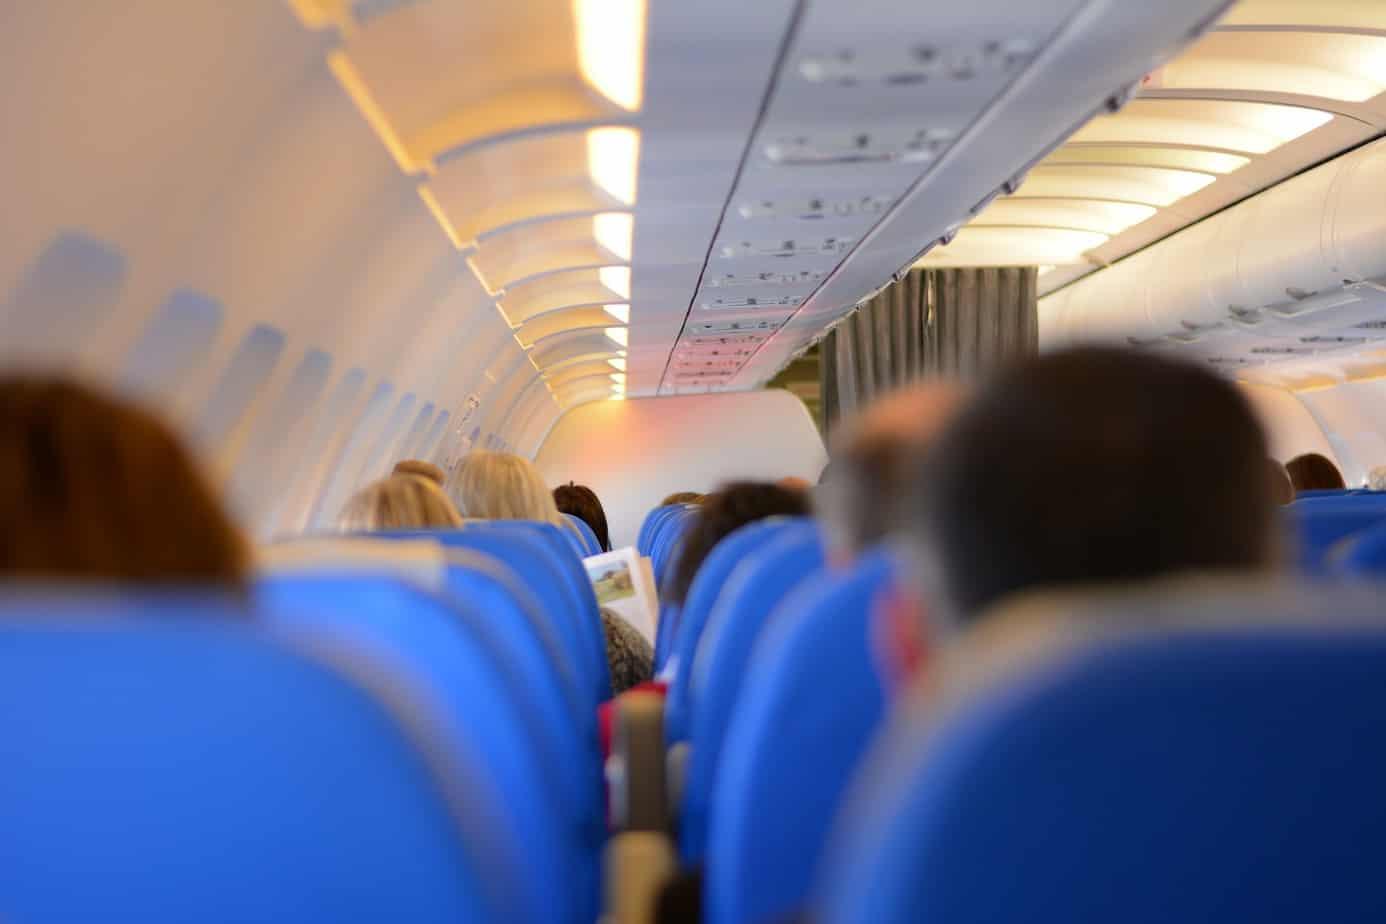 seats on a plane